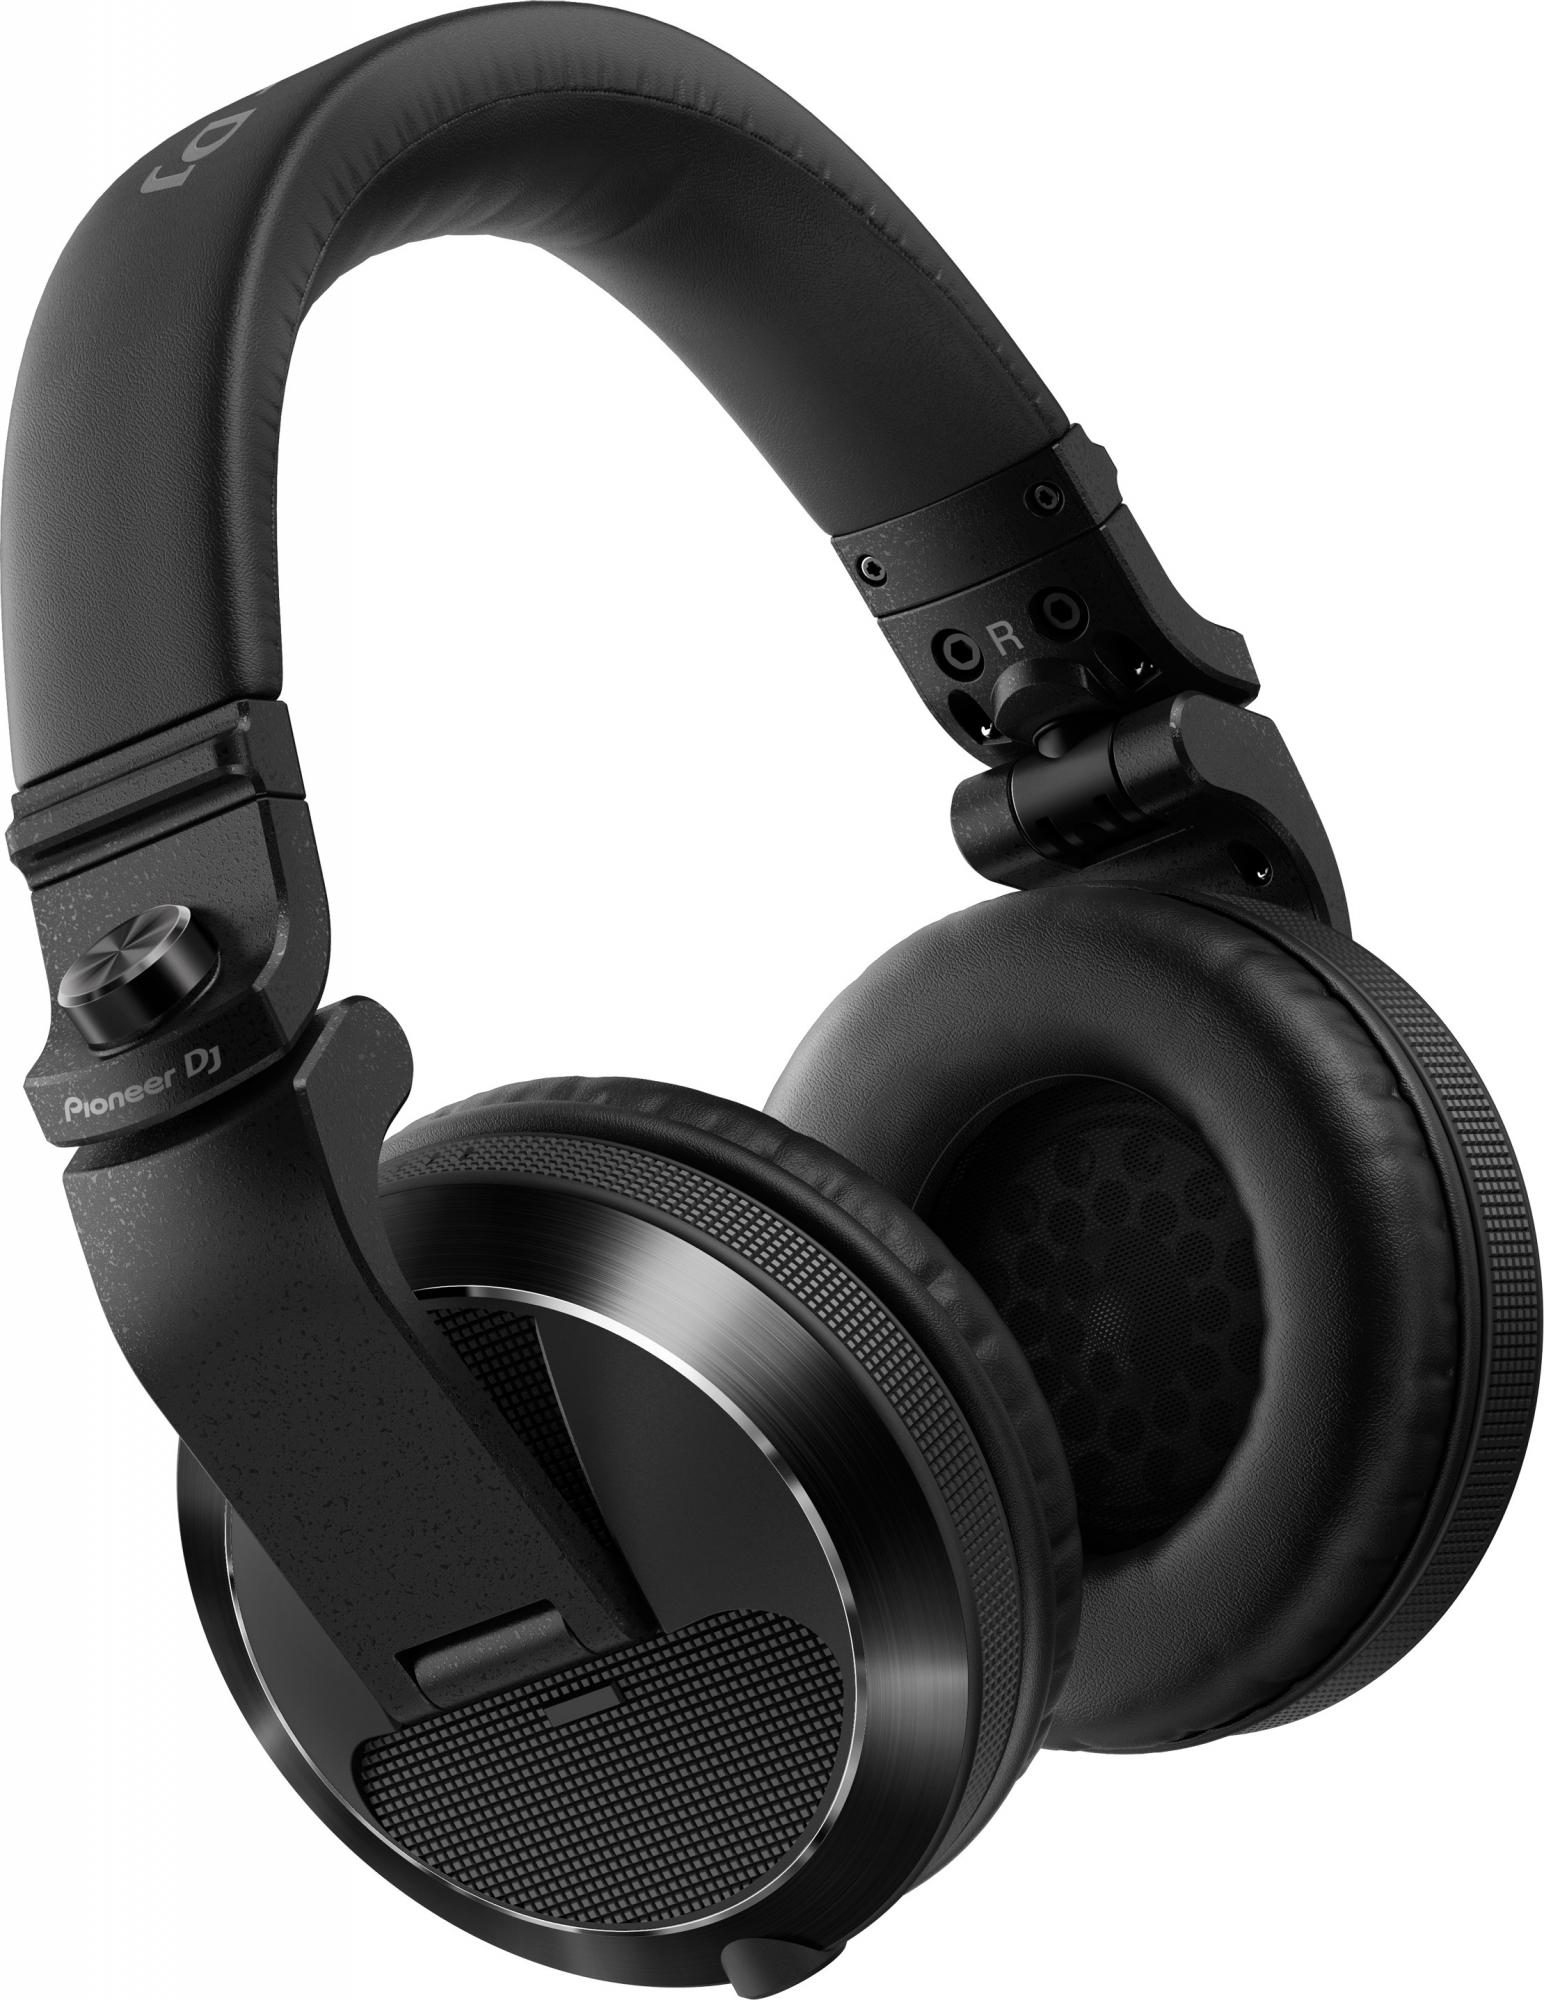 Image of   Pioneer HDJ-X7 DJ hovedtelefon Sort